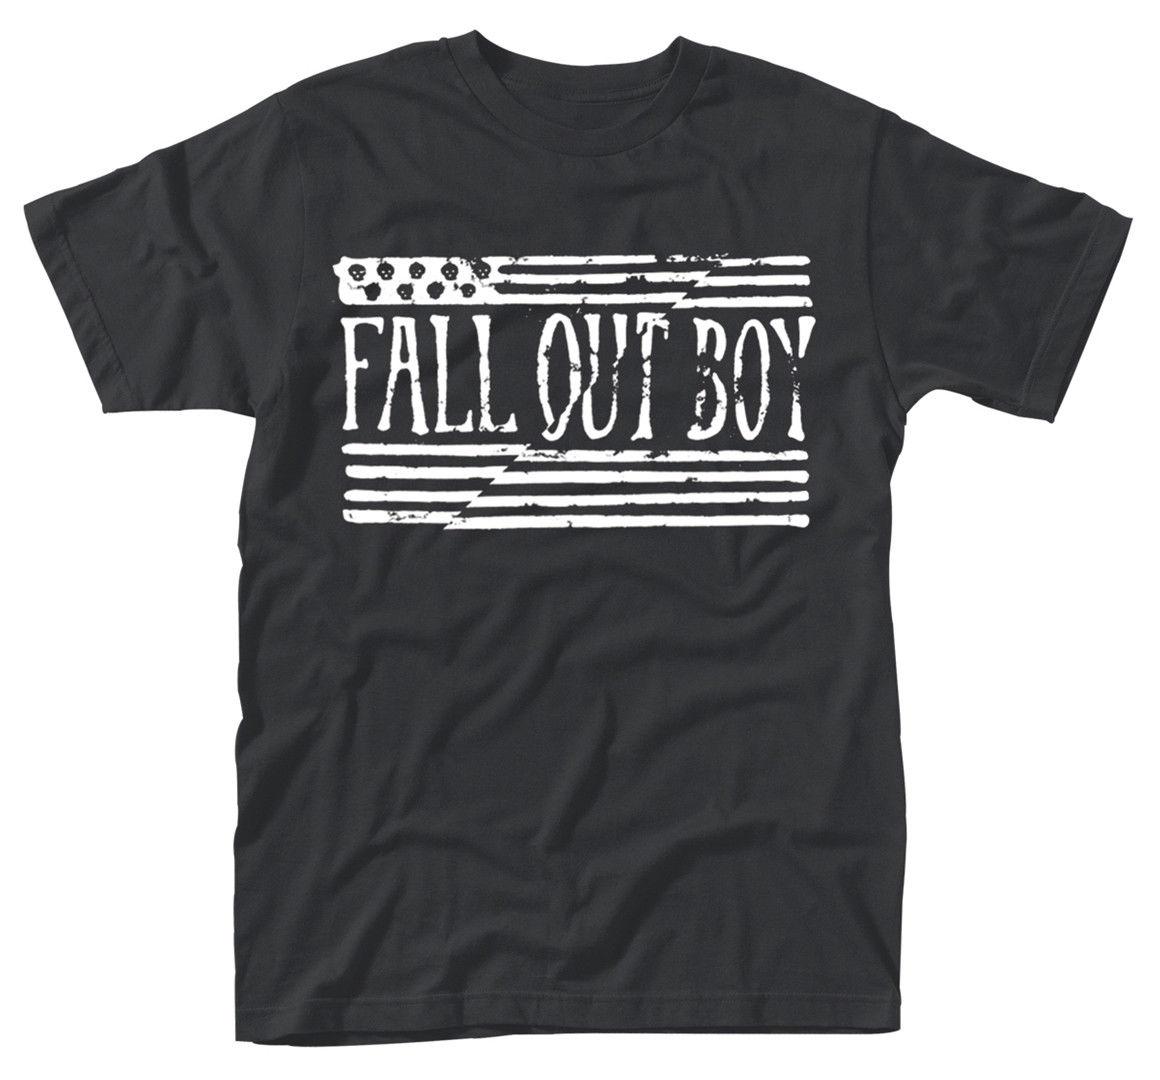 Fall Out Boy US Flag T-SHIRT - NUOVO E ORIGINALE